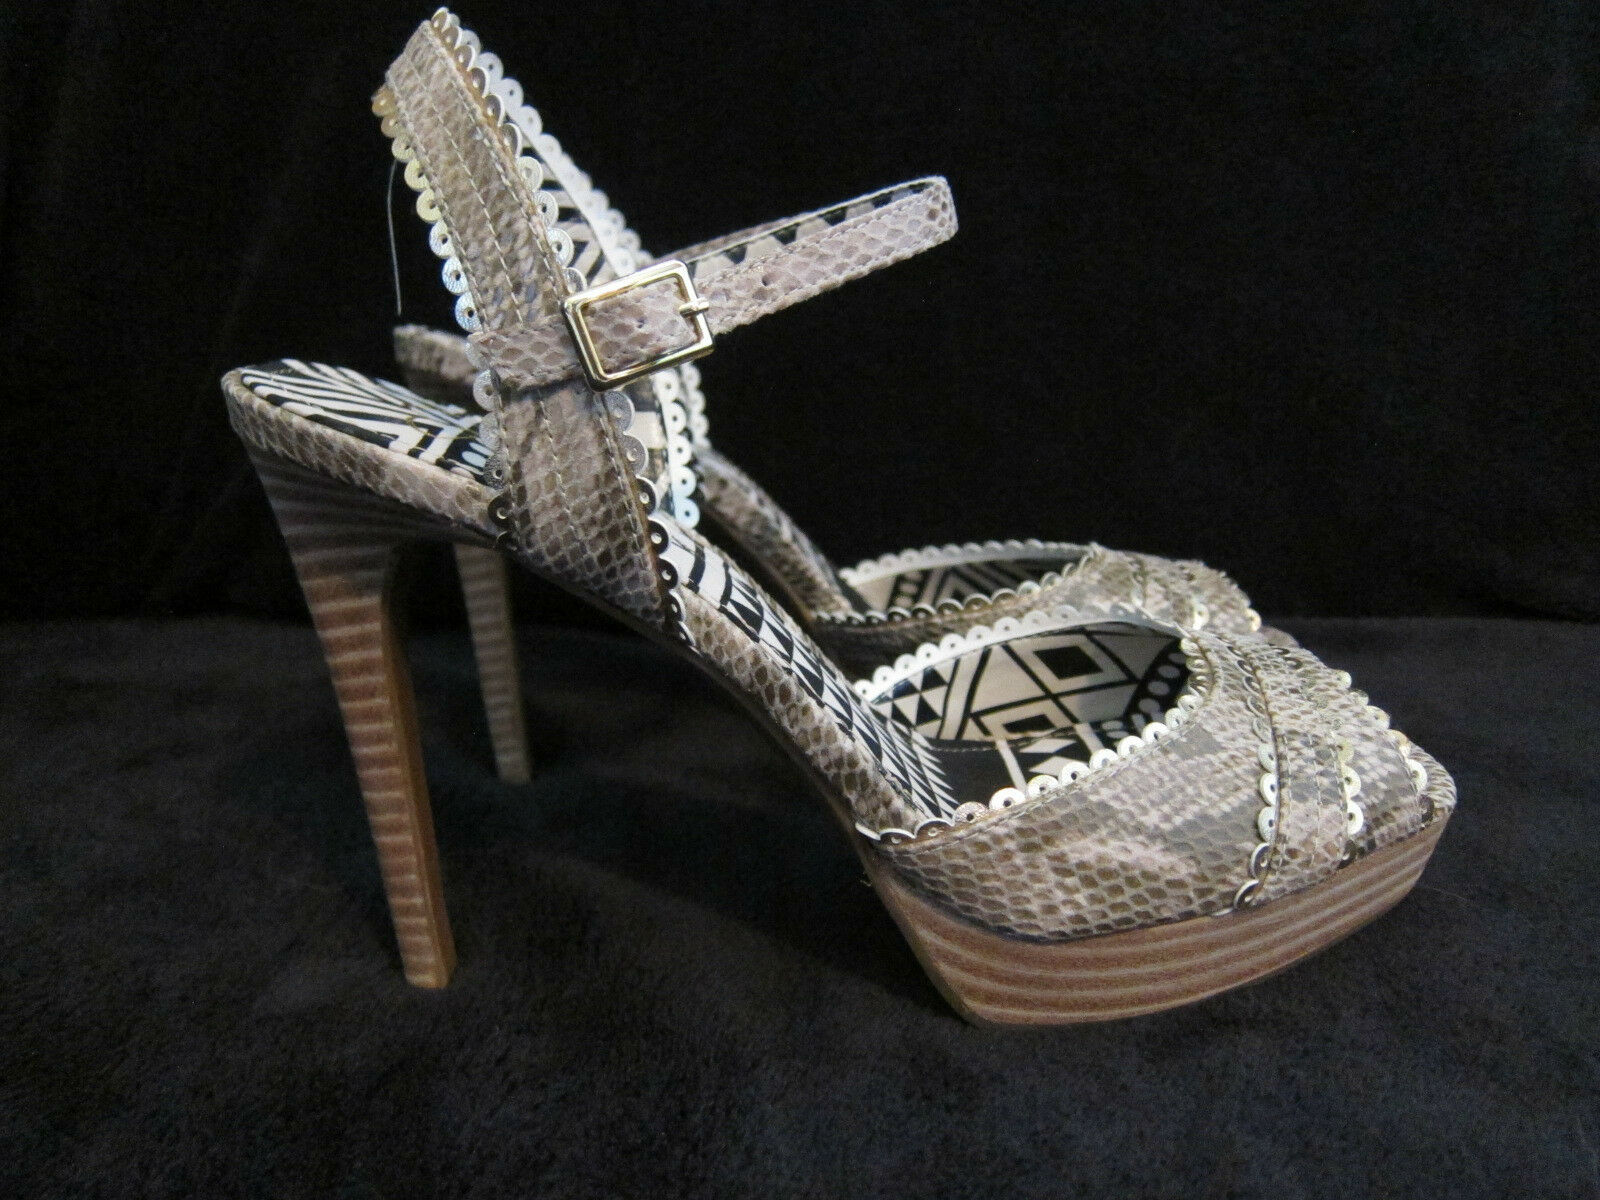 JESSICA SIMPSON Blazie Python & gold Platform Heels Open Toe shoes US 8 M NWOB